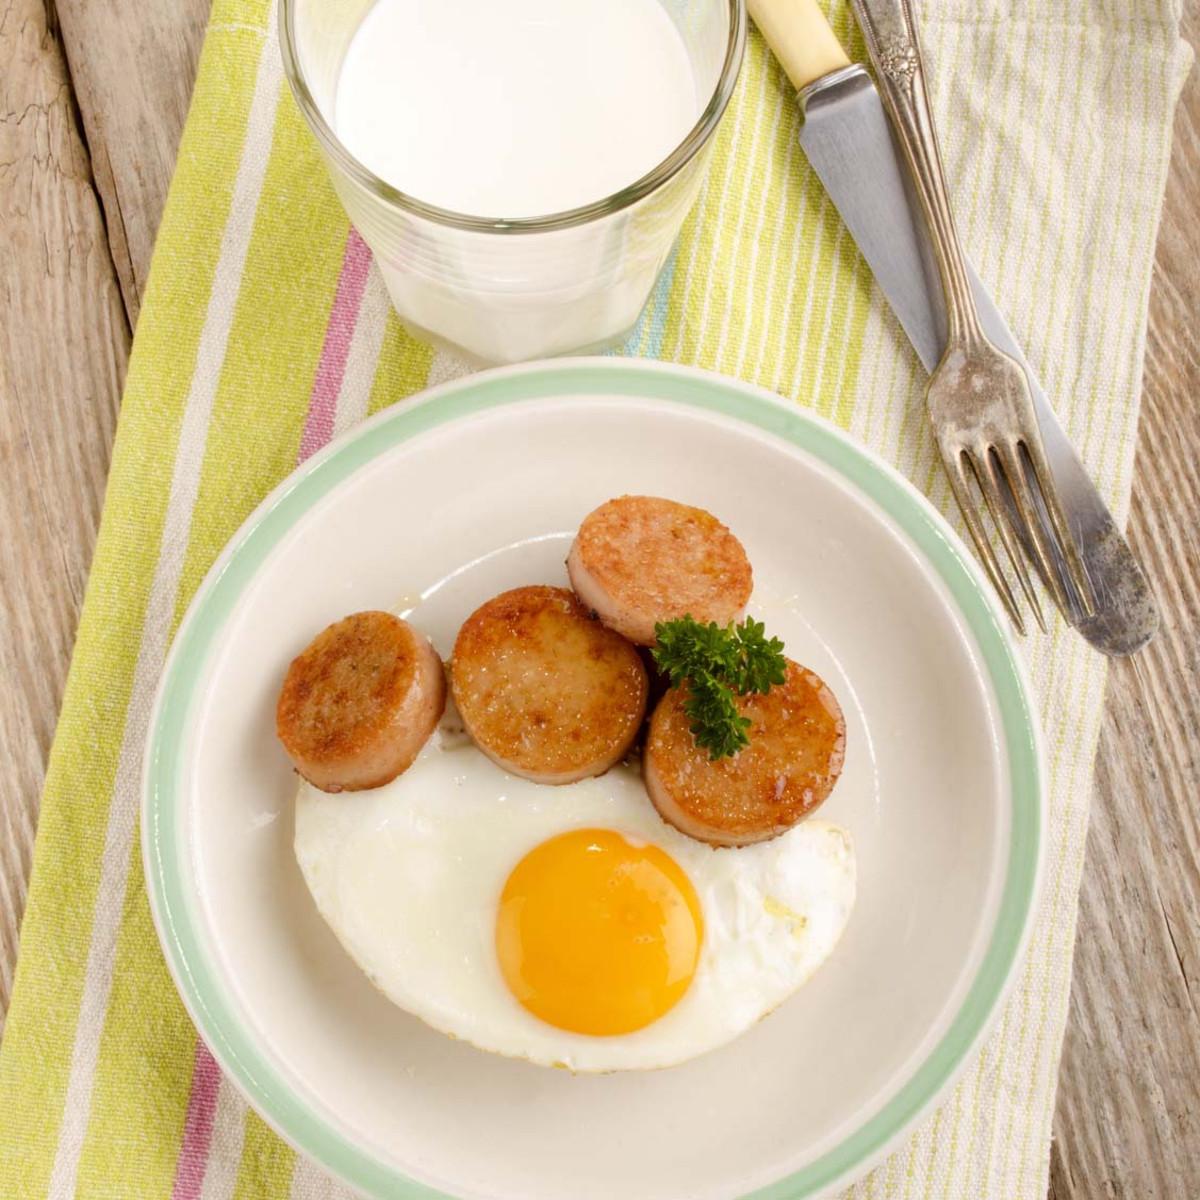 Irish White Pudding Ring 5lbs (Food Service)